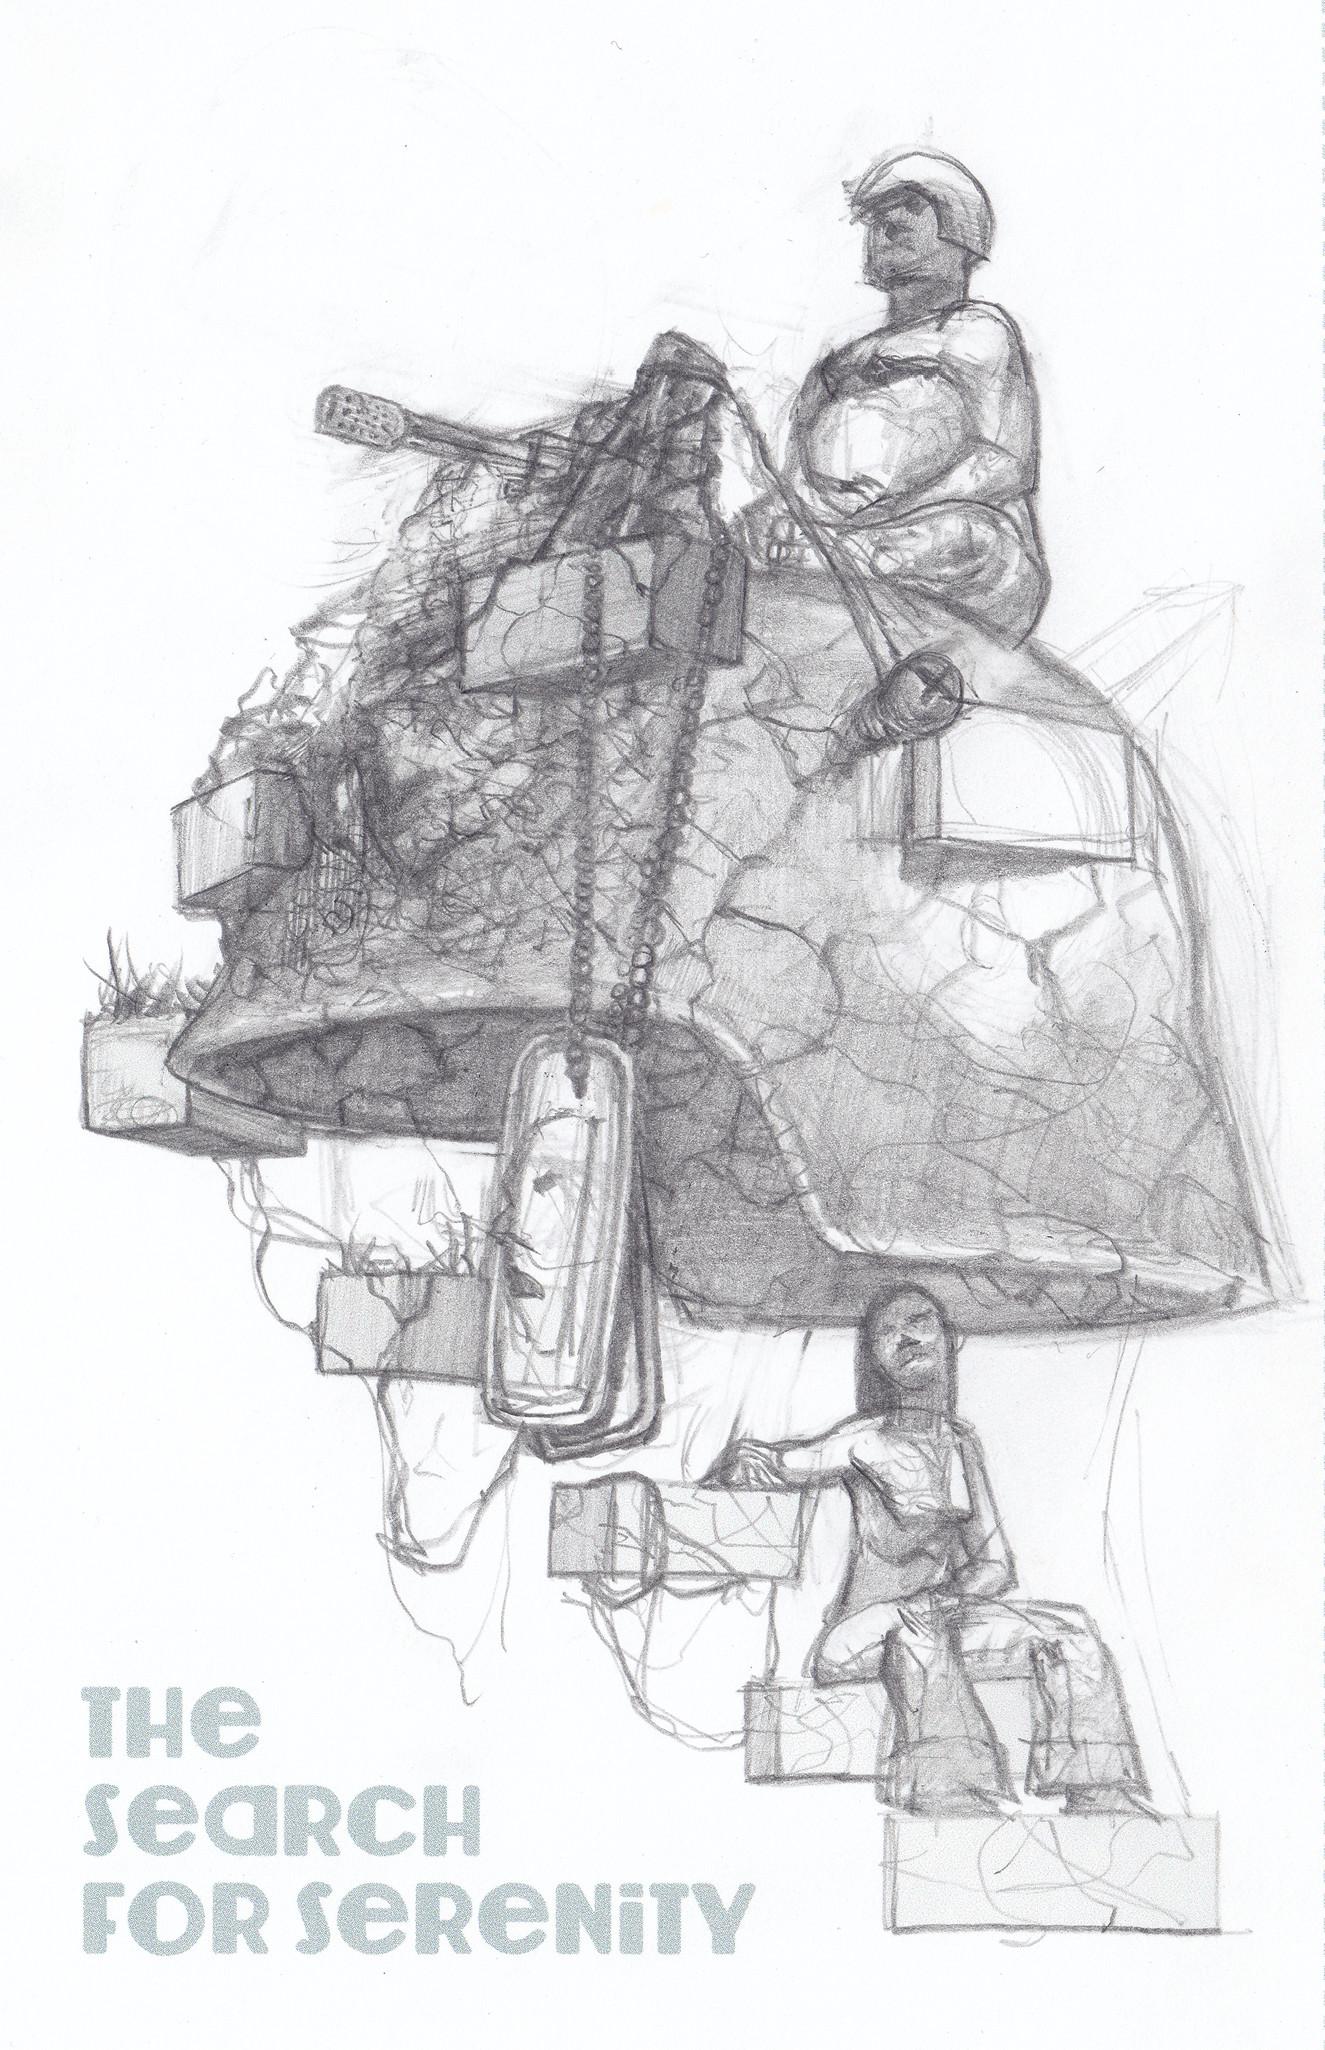 Charles kent charles kent illustration portfolio13